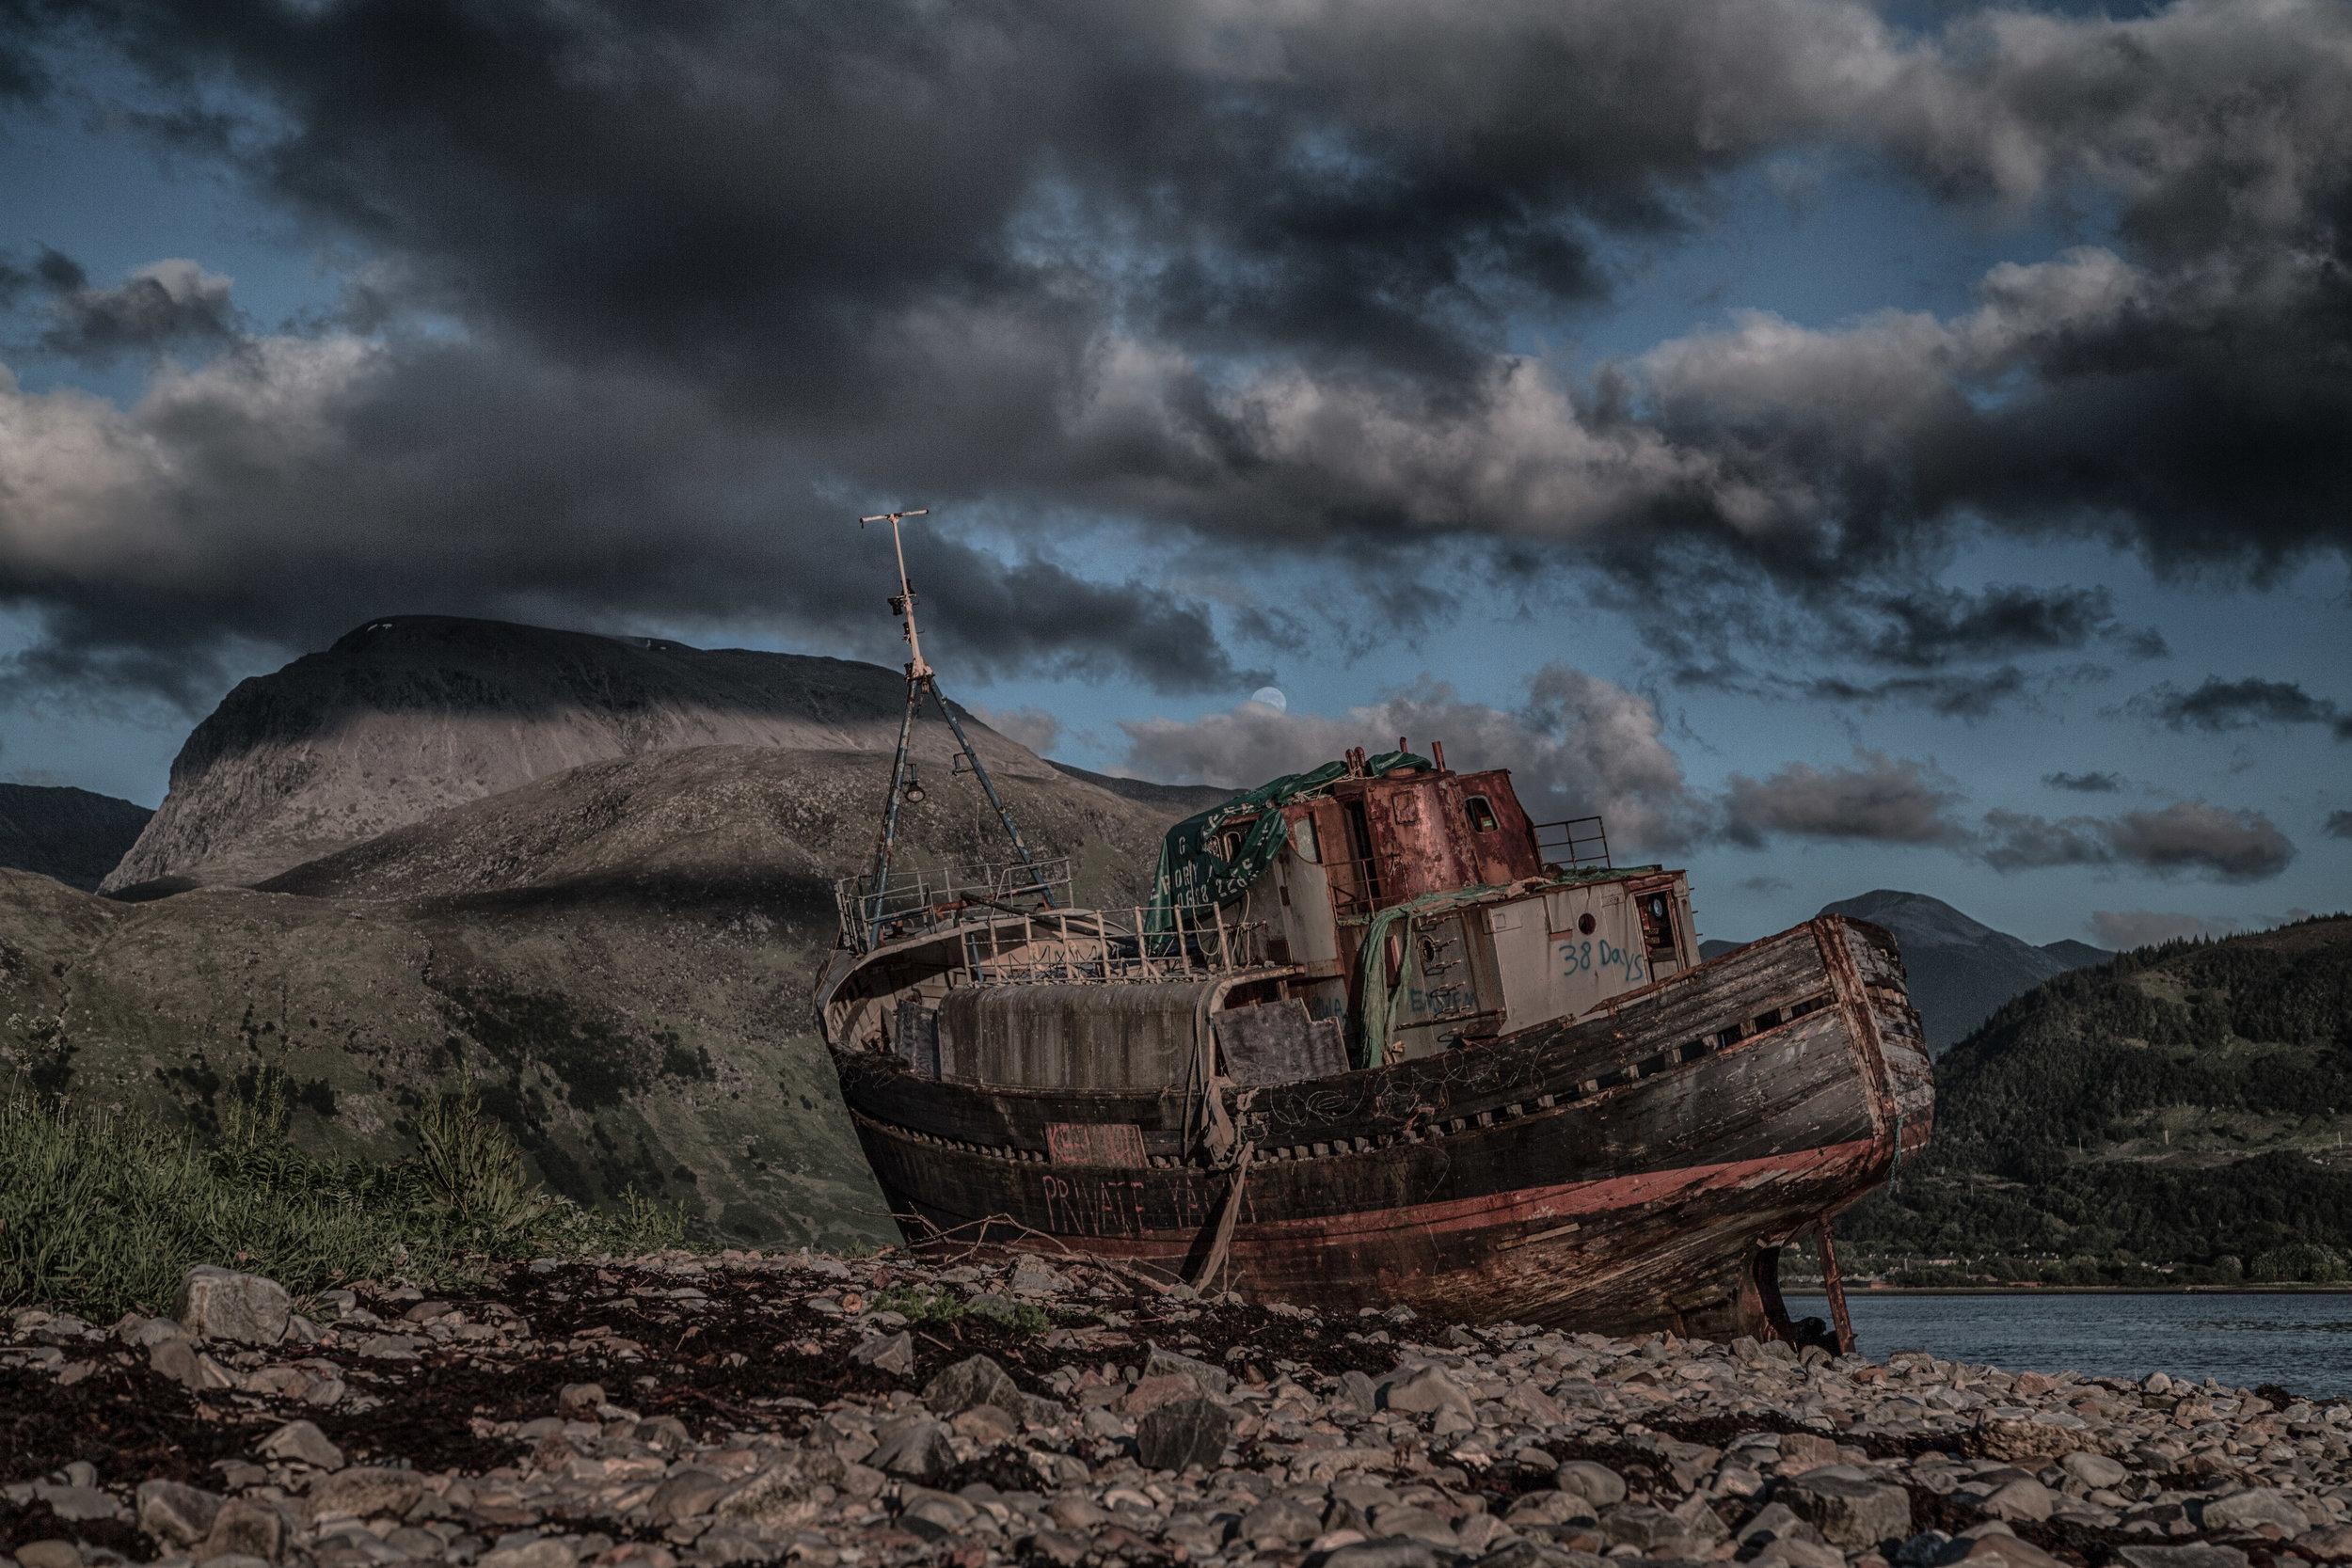 Fishing Vessel and Ben Nevis